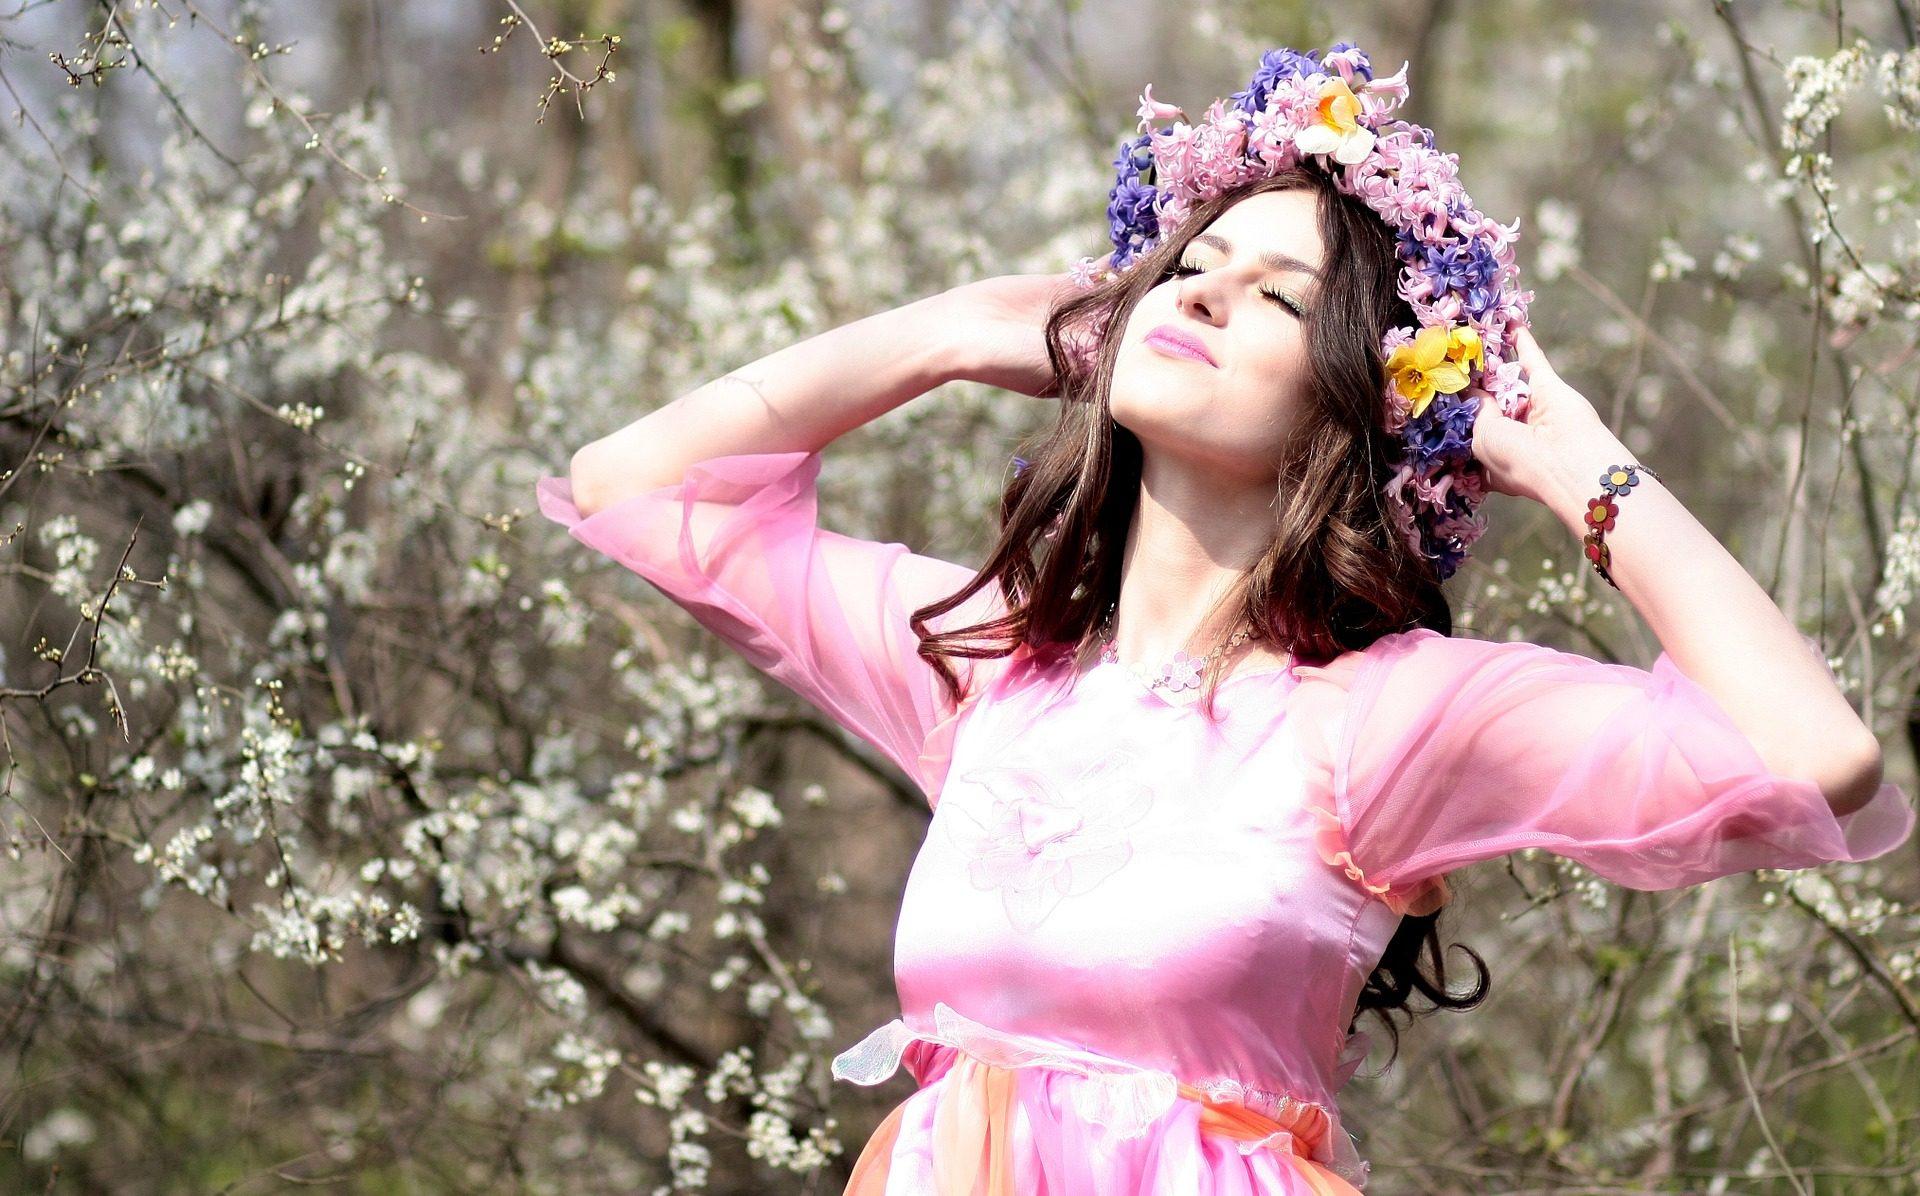 Картинка девушка радуется весне